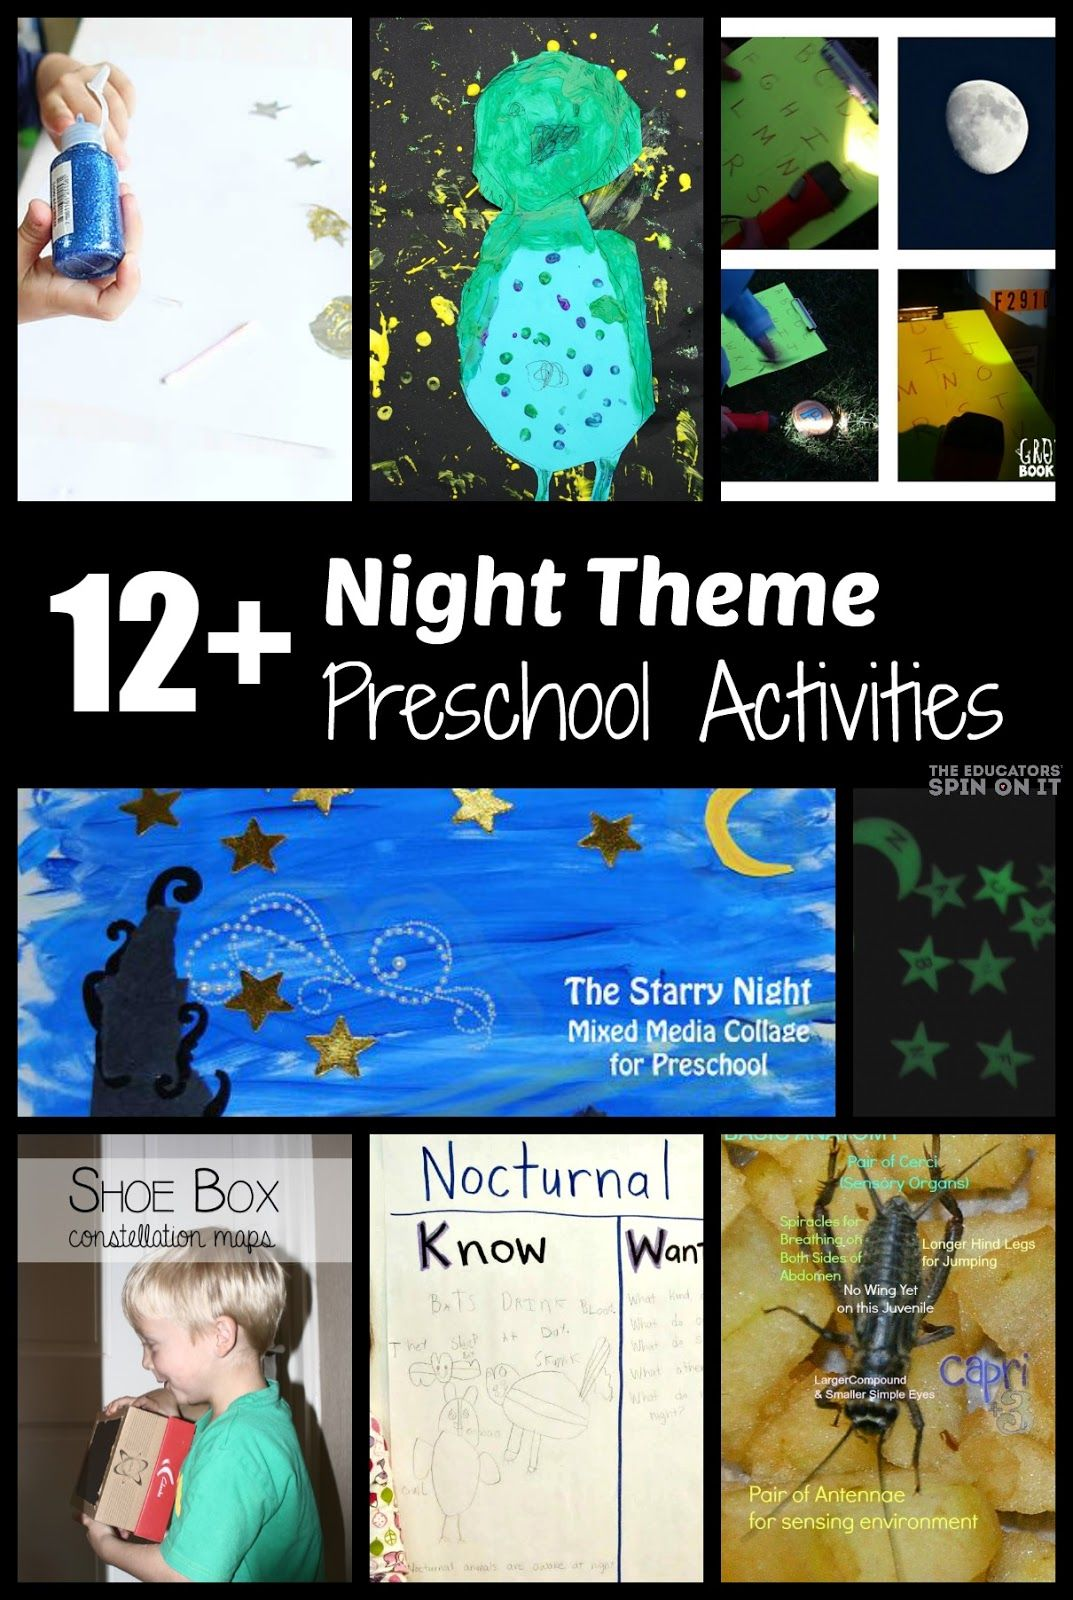 Nighttime Preschool Activities Night Owl Painting And